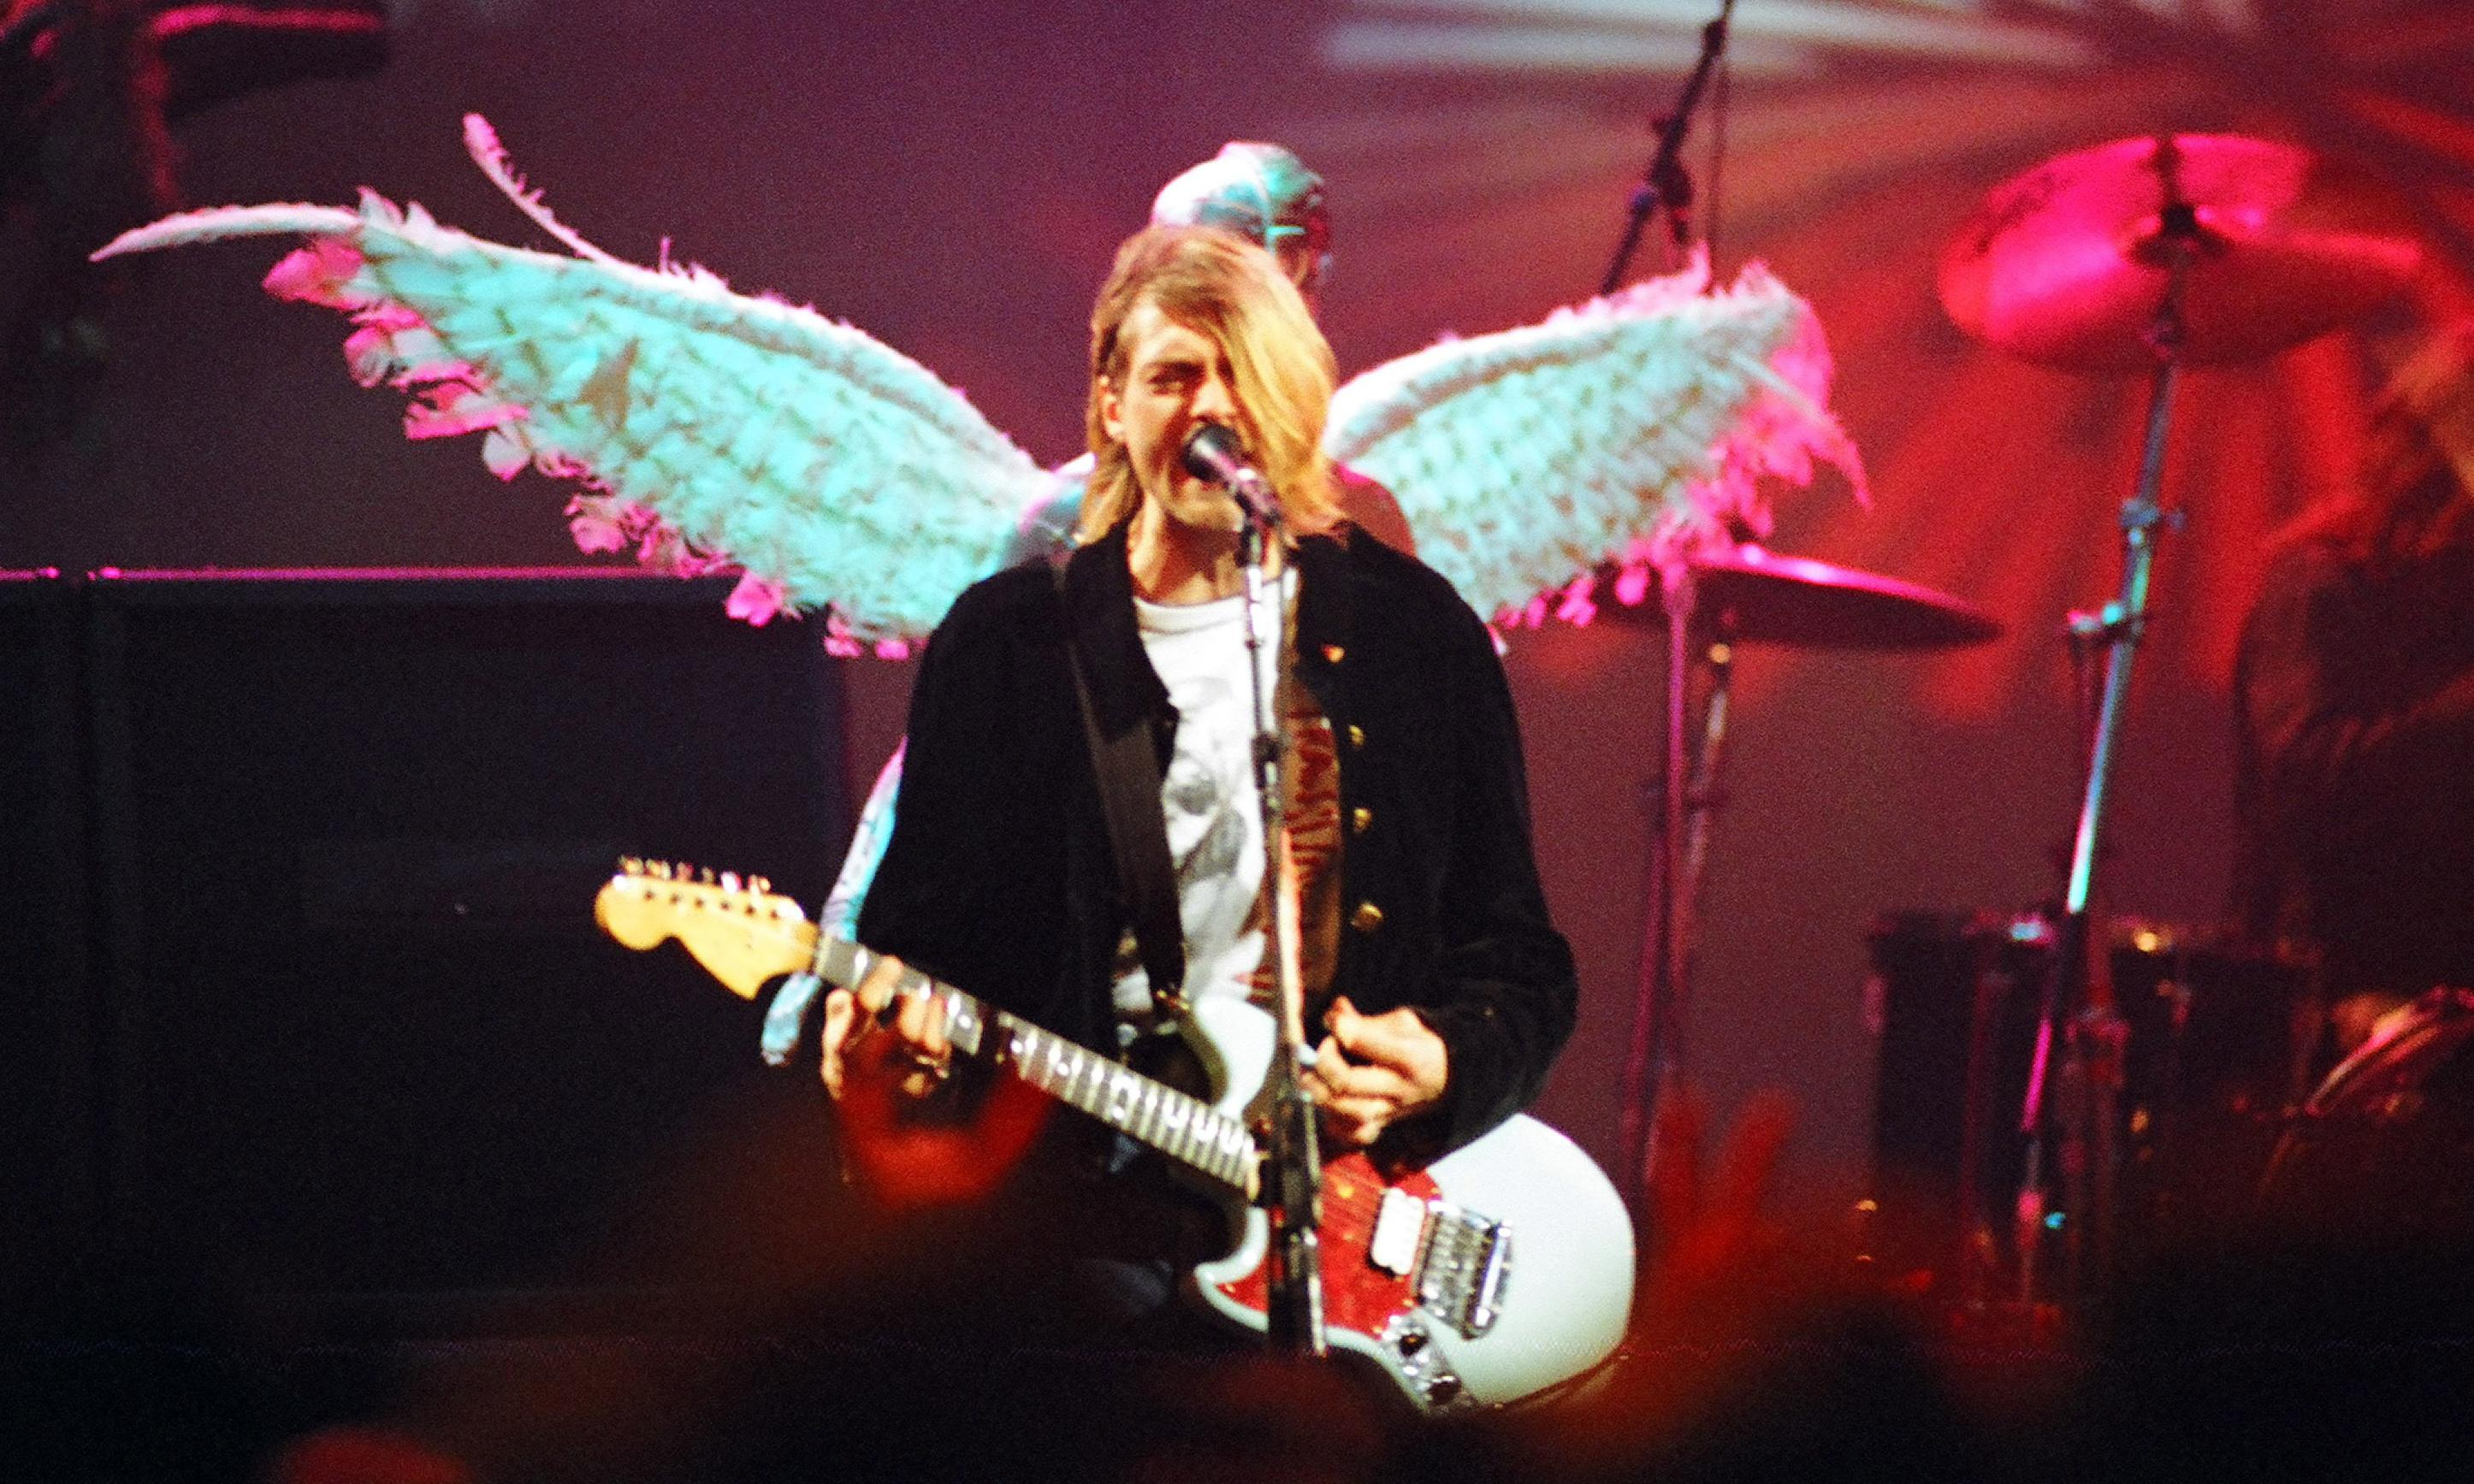 Nirvana's 20 greatest songs – ranked!